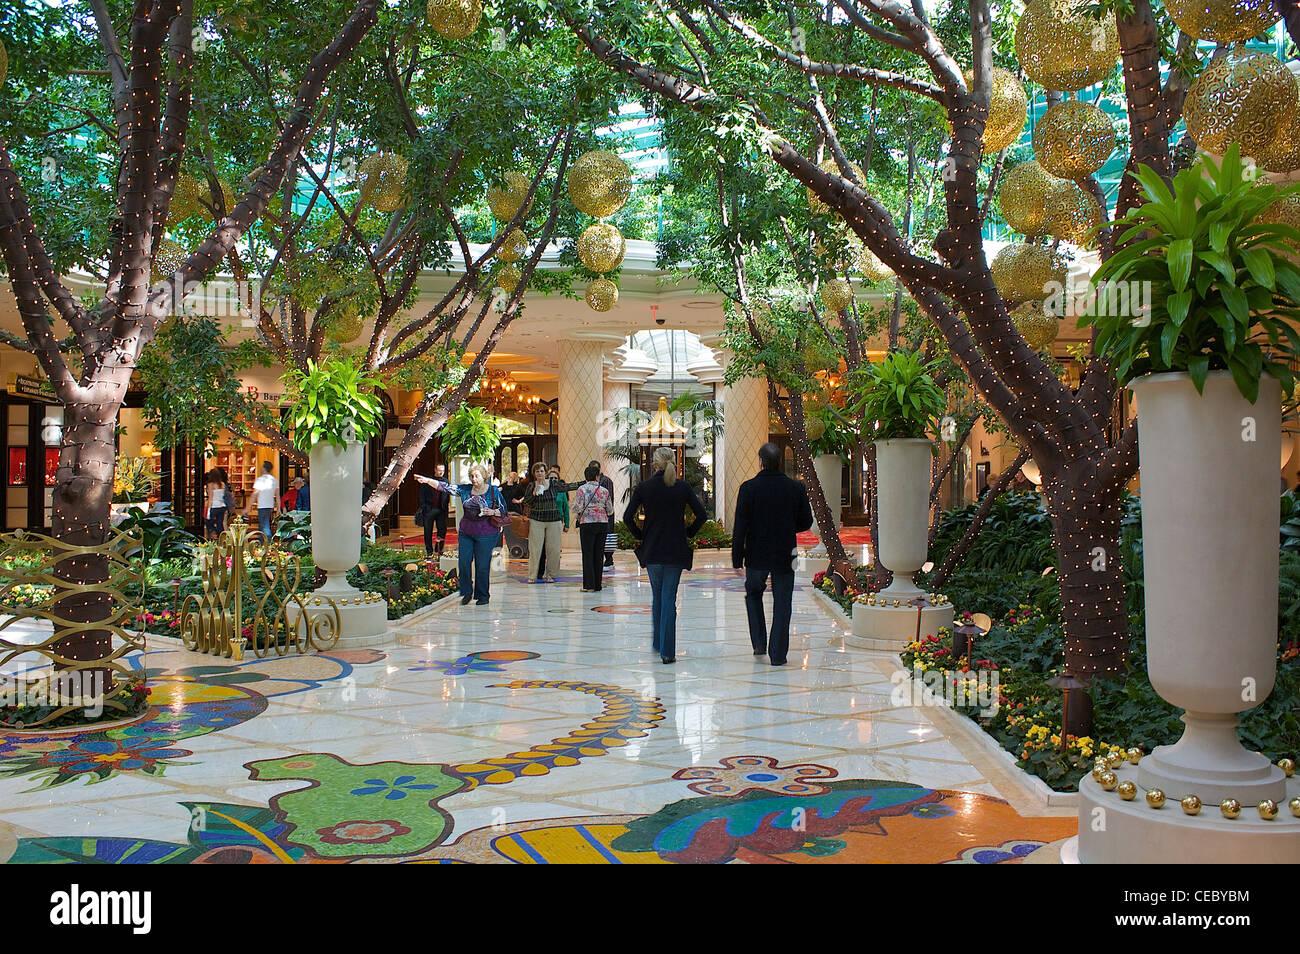 Inside The Wynn Las Vegas Hotel And Casino Stock Photo Alamy